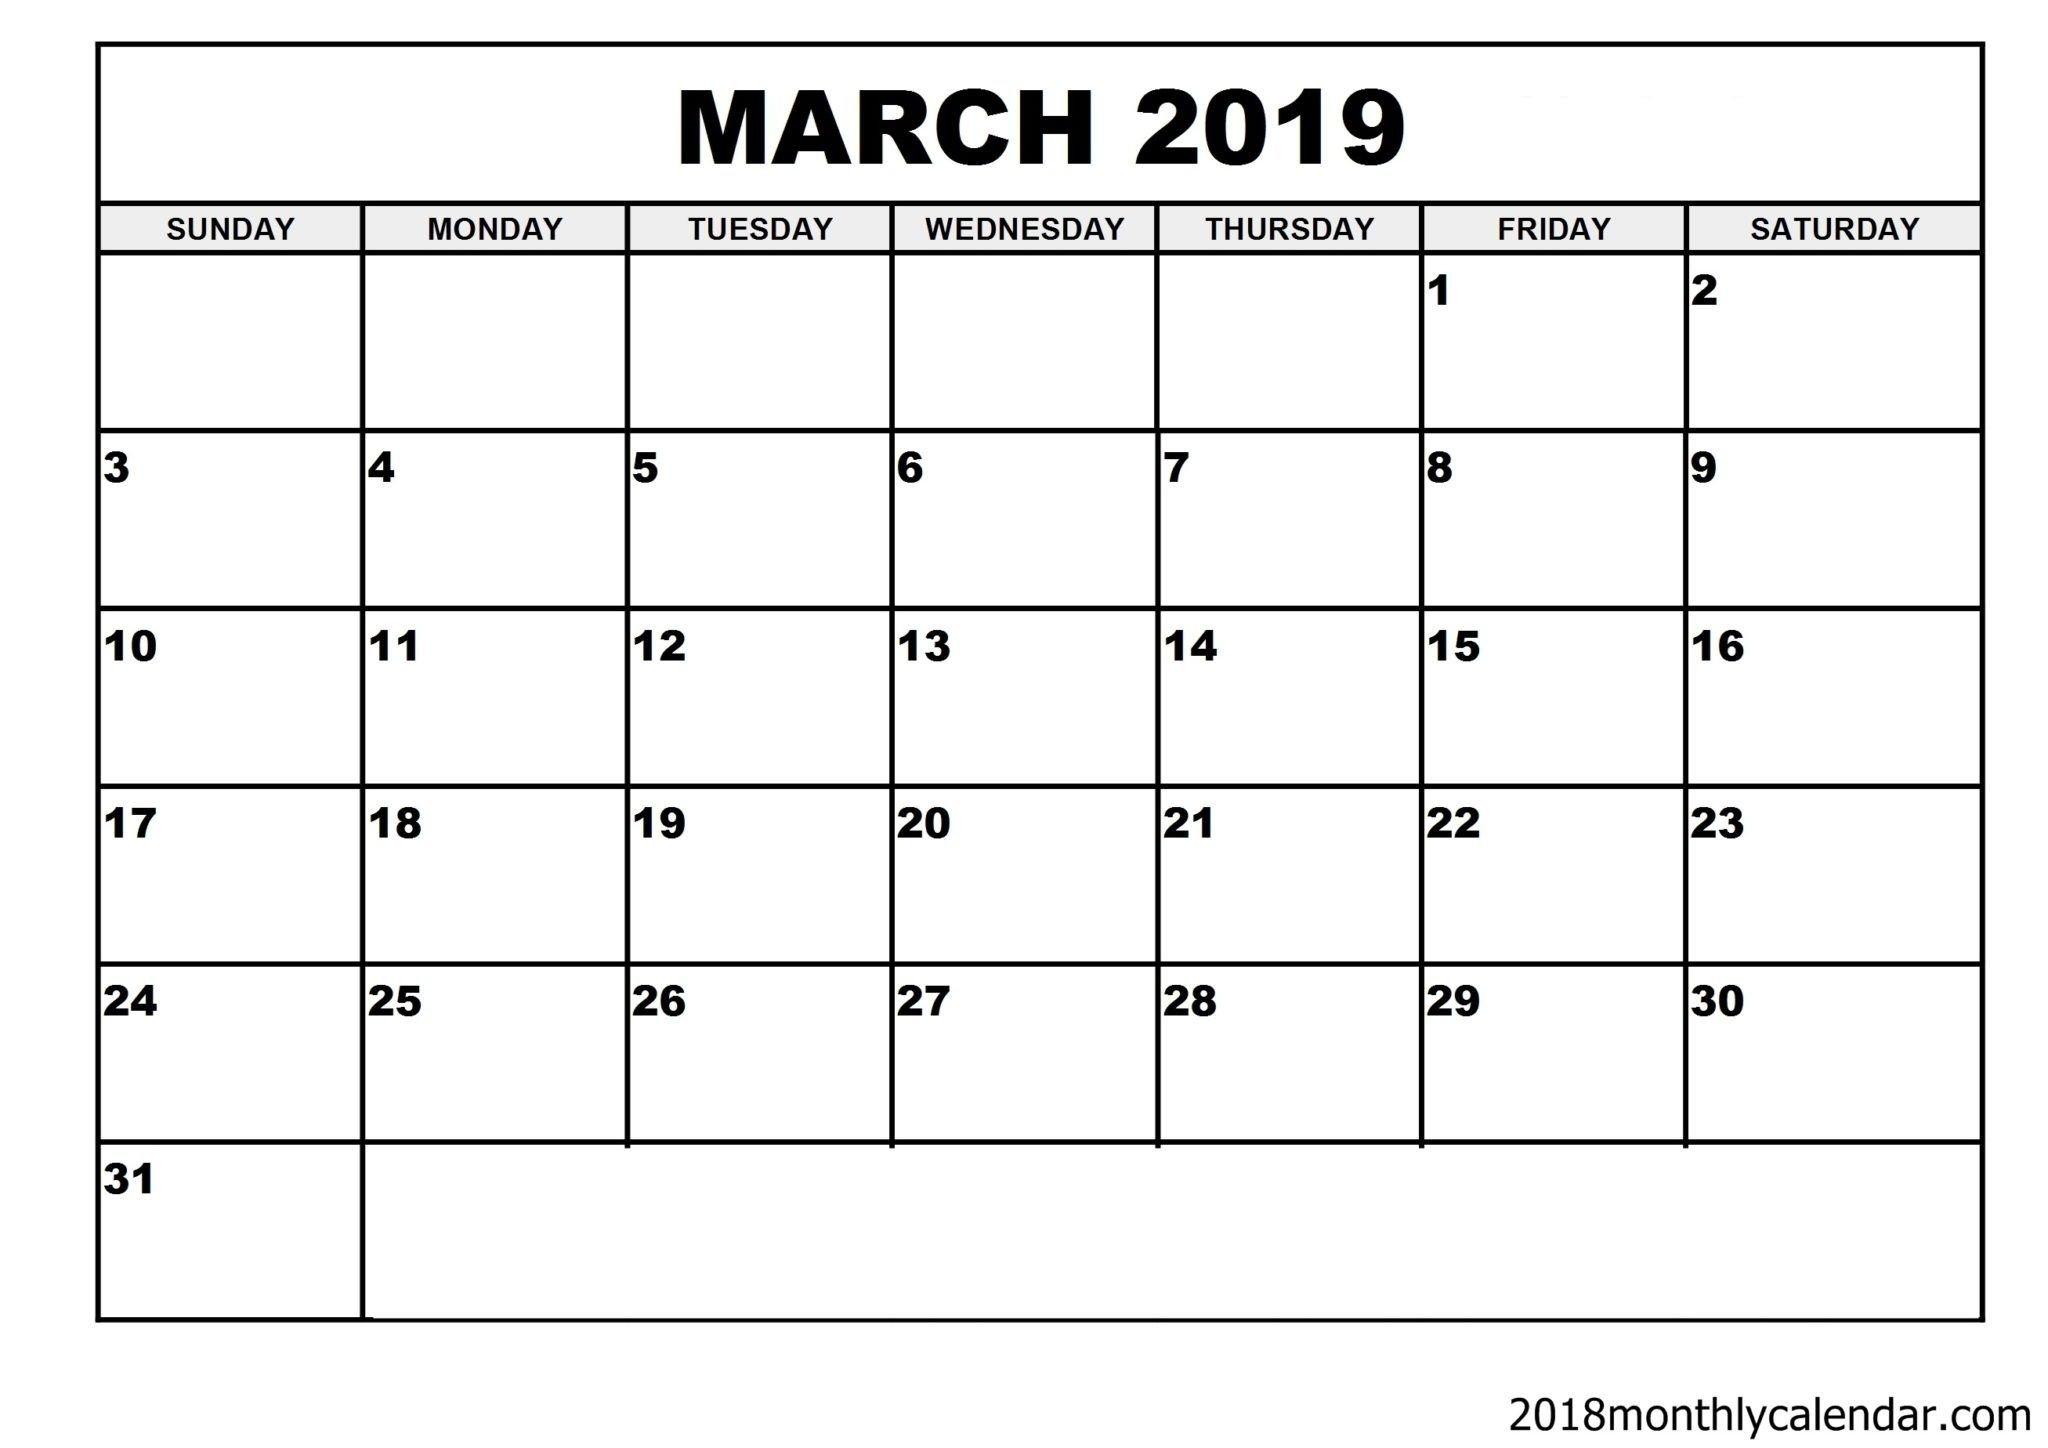 Download March 2019 Calendar – Blank Template – Editable Blank 31 Day Calendar Form